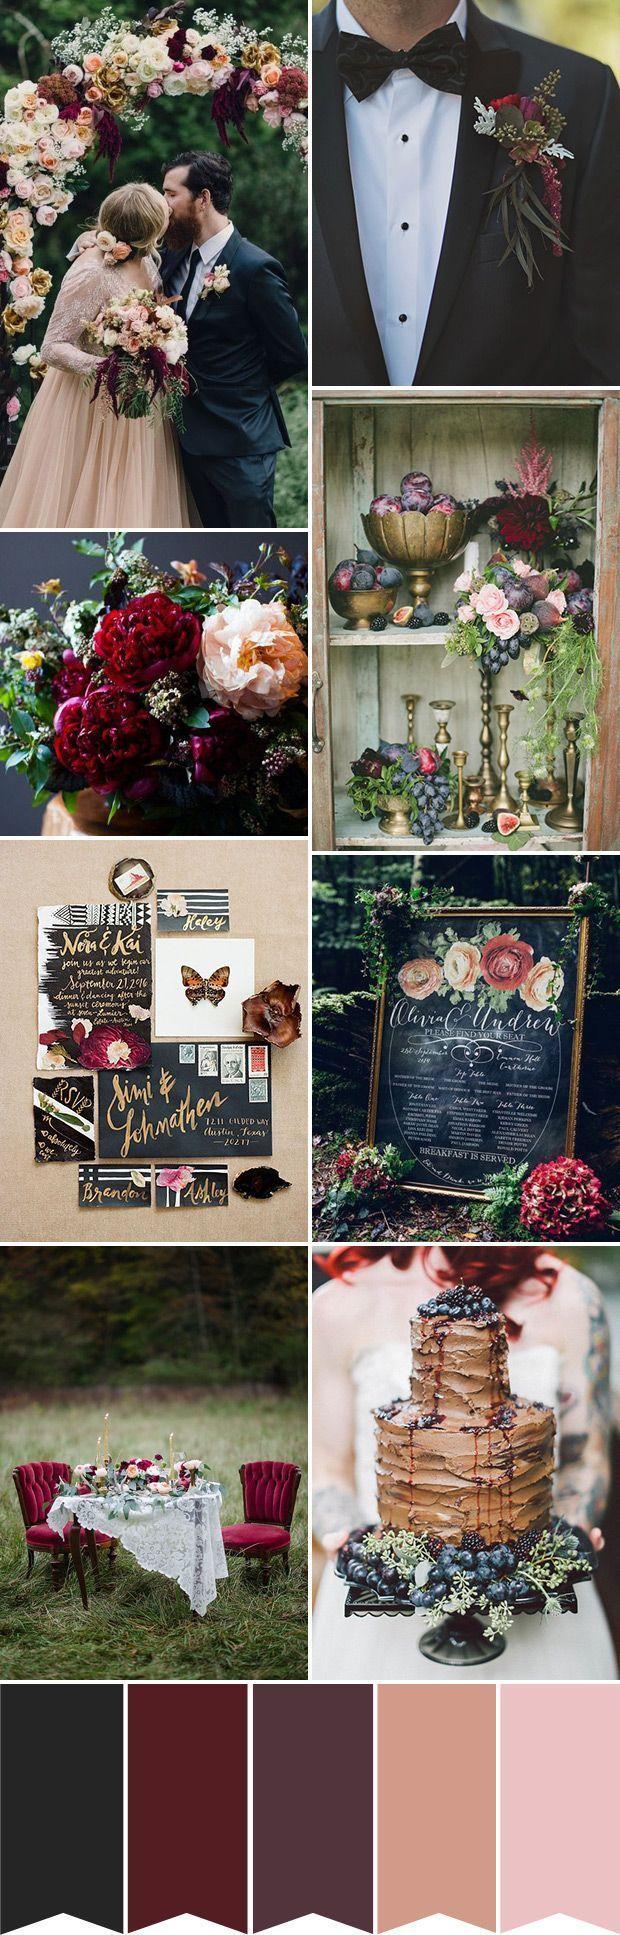 Dark Woodland Romance: Berry Red and Black Winter Wedding Palette